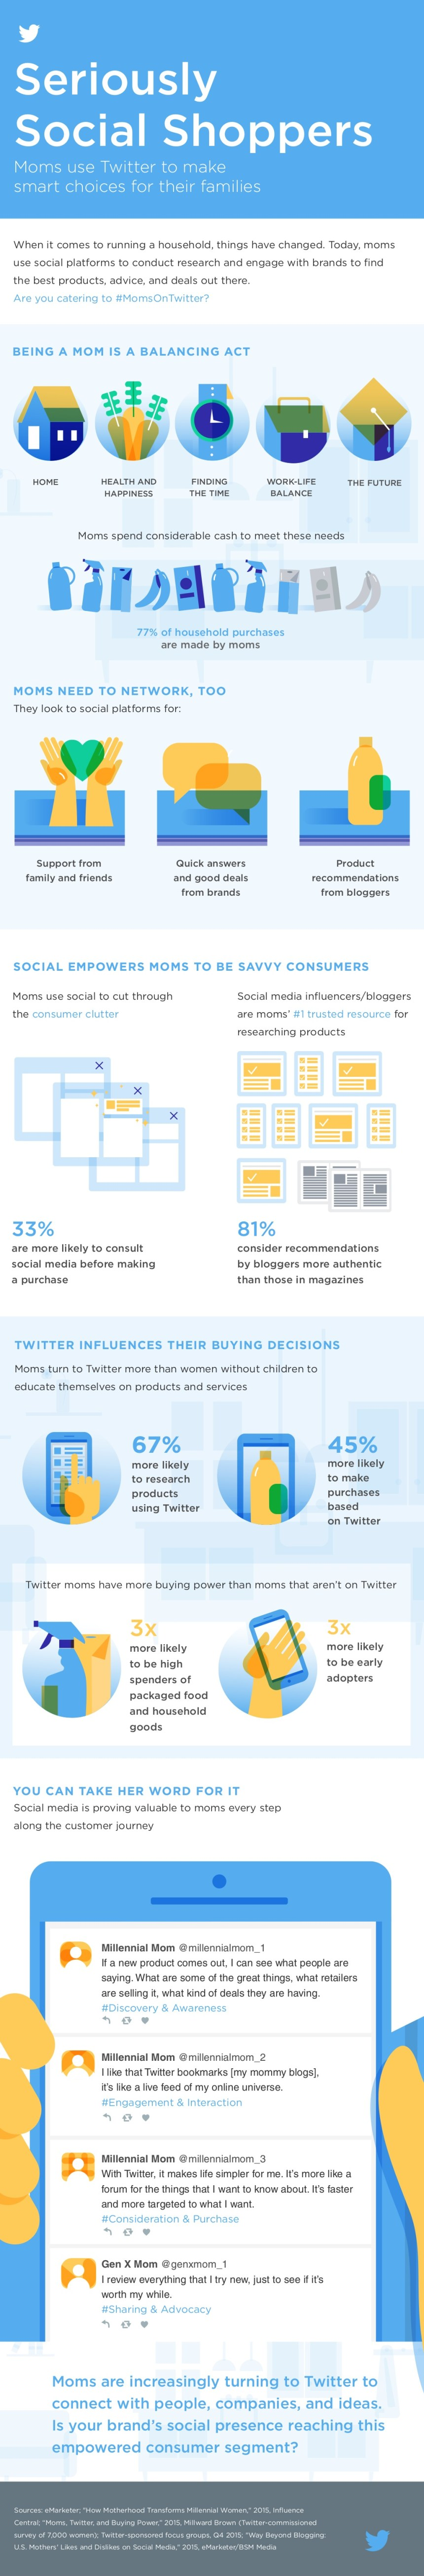 Social Shoppers: cómo las madres usan Twitter